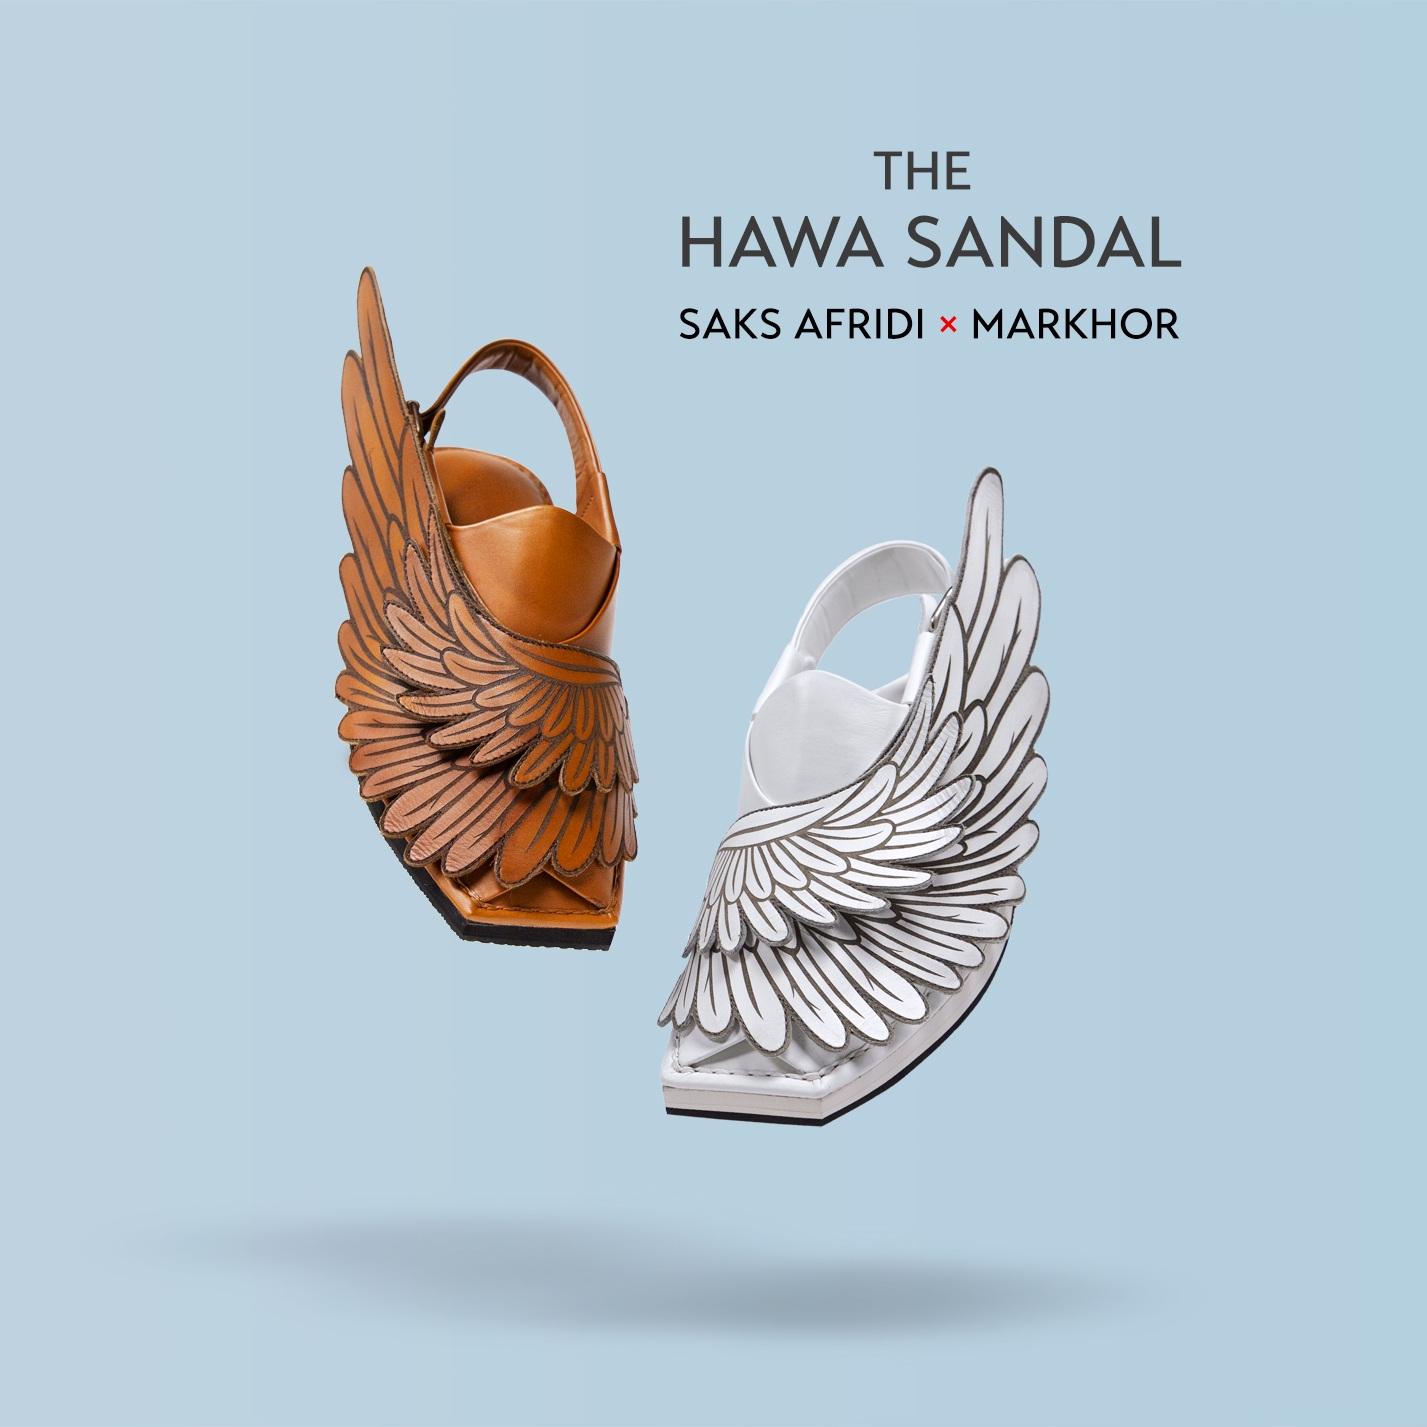 Hawa Sandal